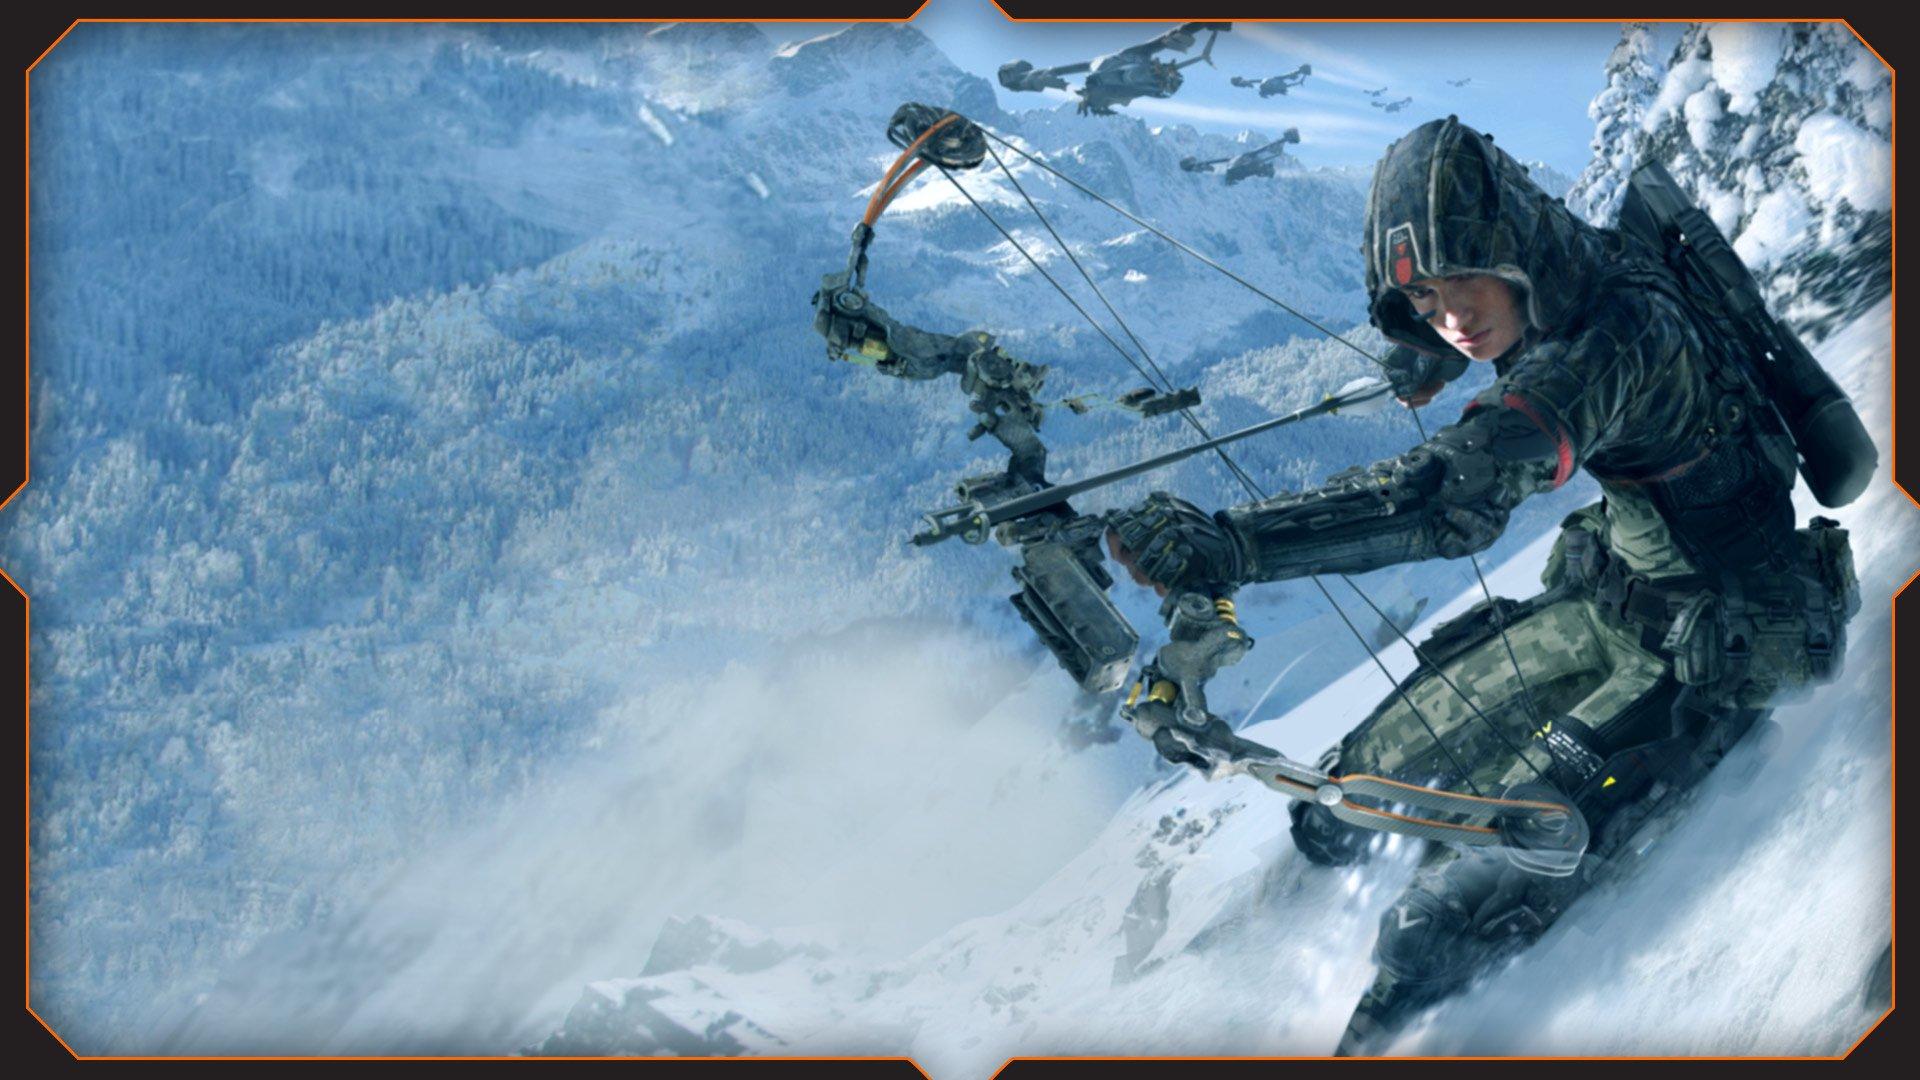 Call Of Duty Black Ops Iii Hd Wallpaper Background